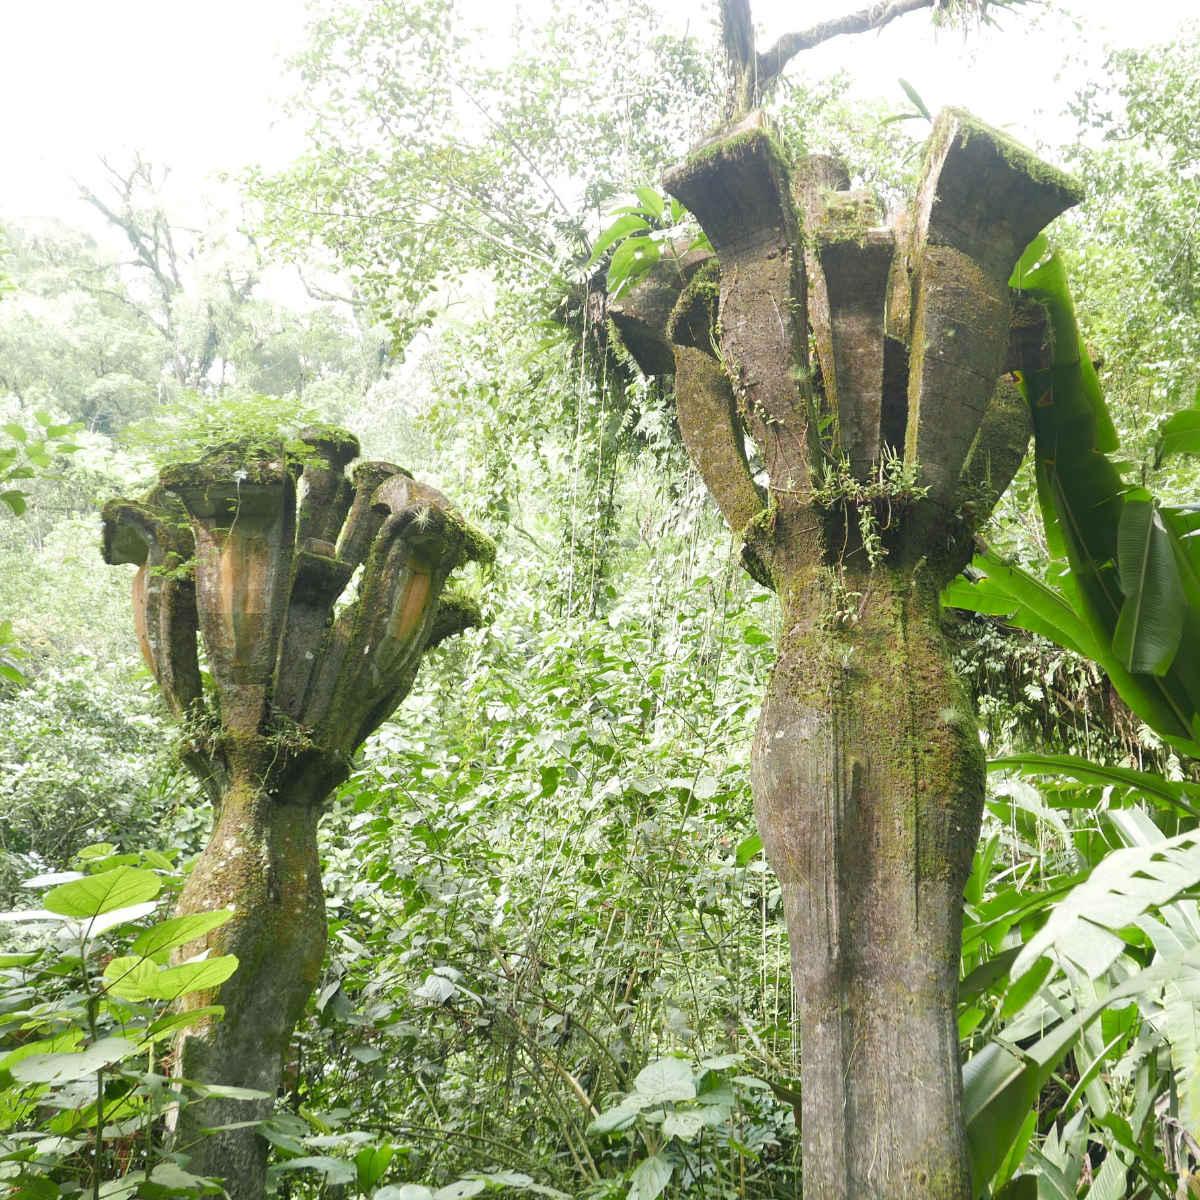 Torches sculpture in Las Pozas surrealist garden in Xilitla